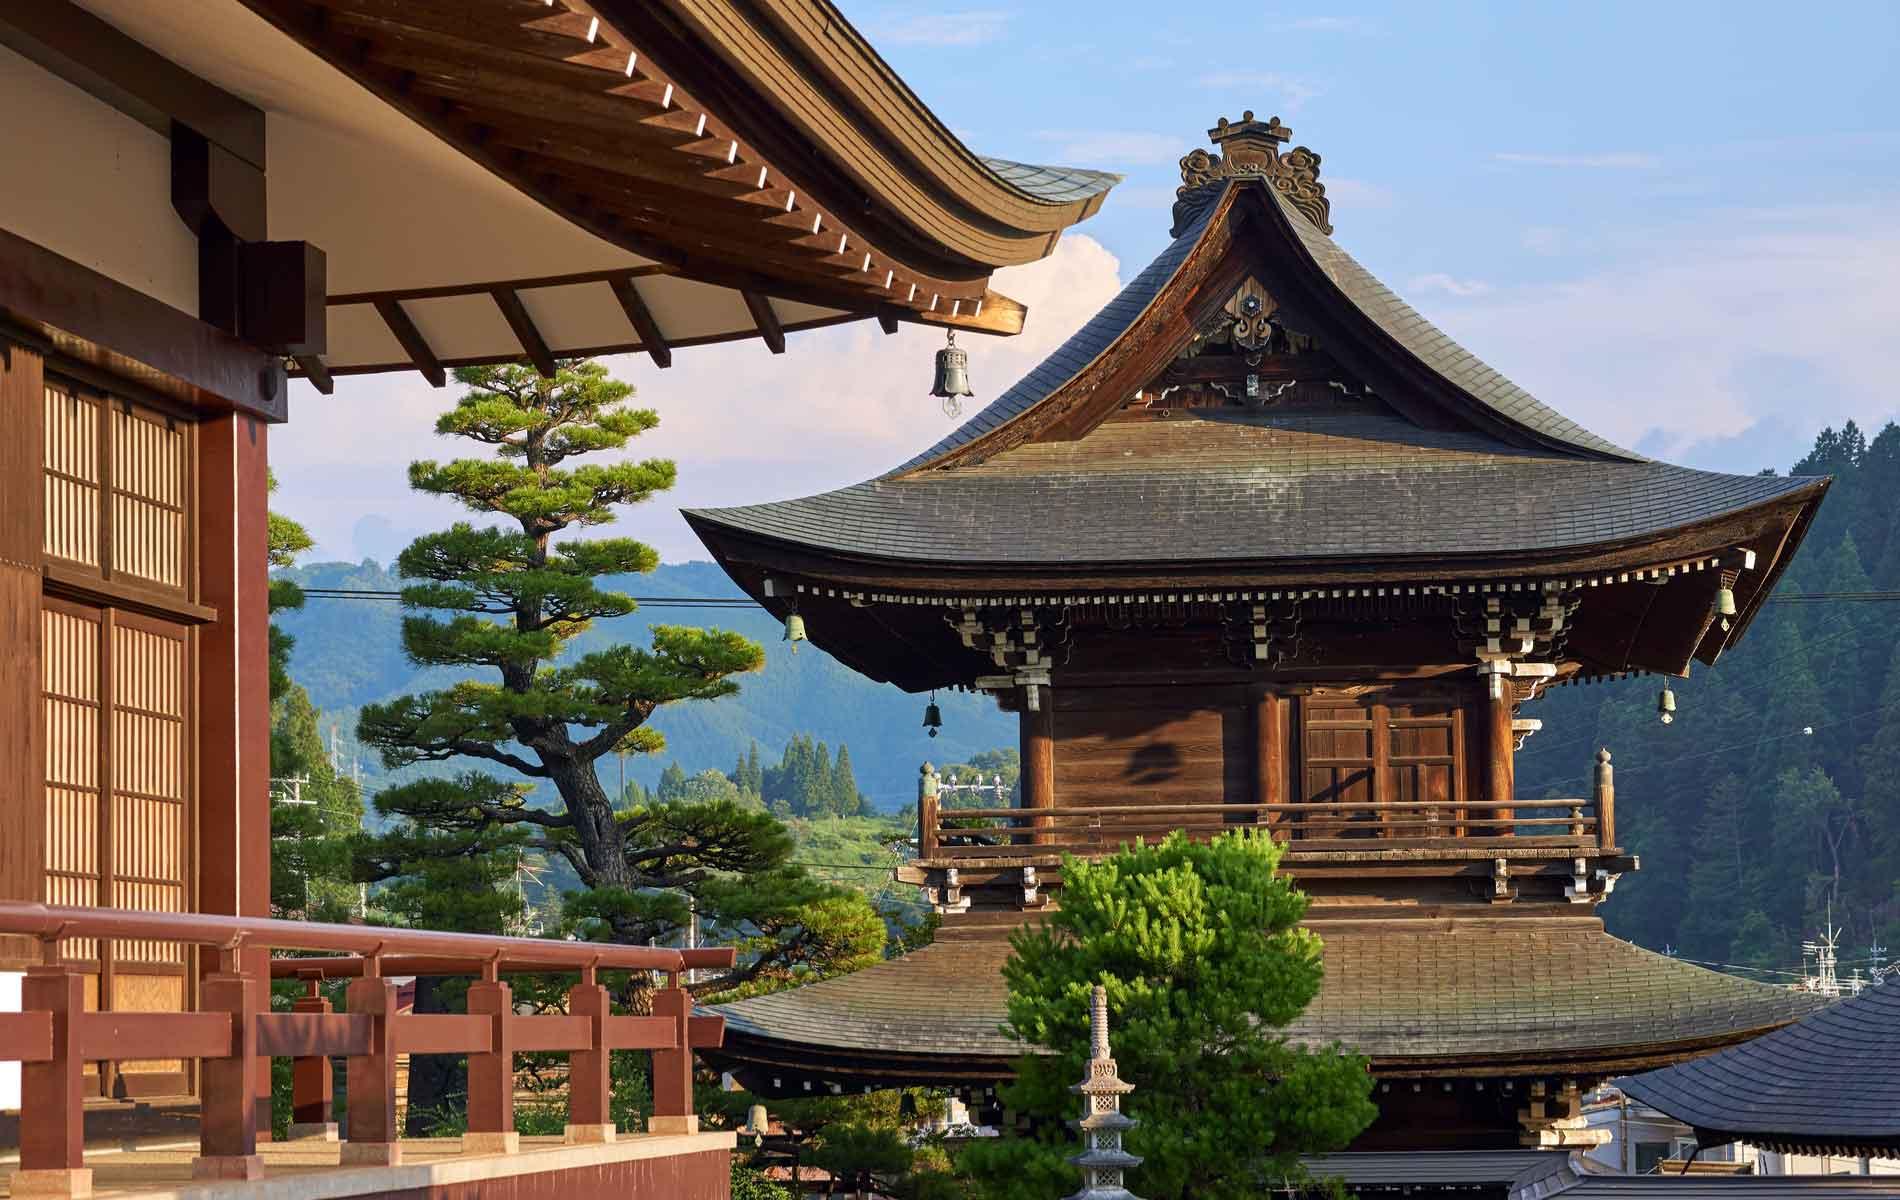 A temple in Takayama, Japan